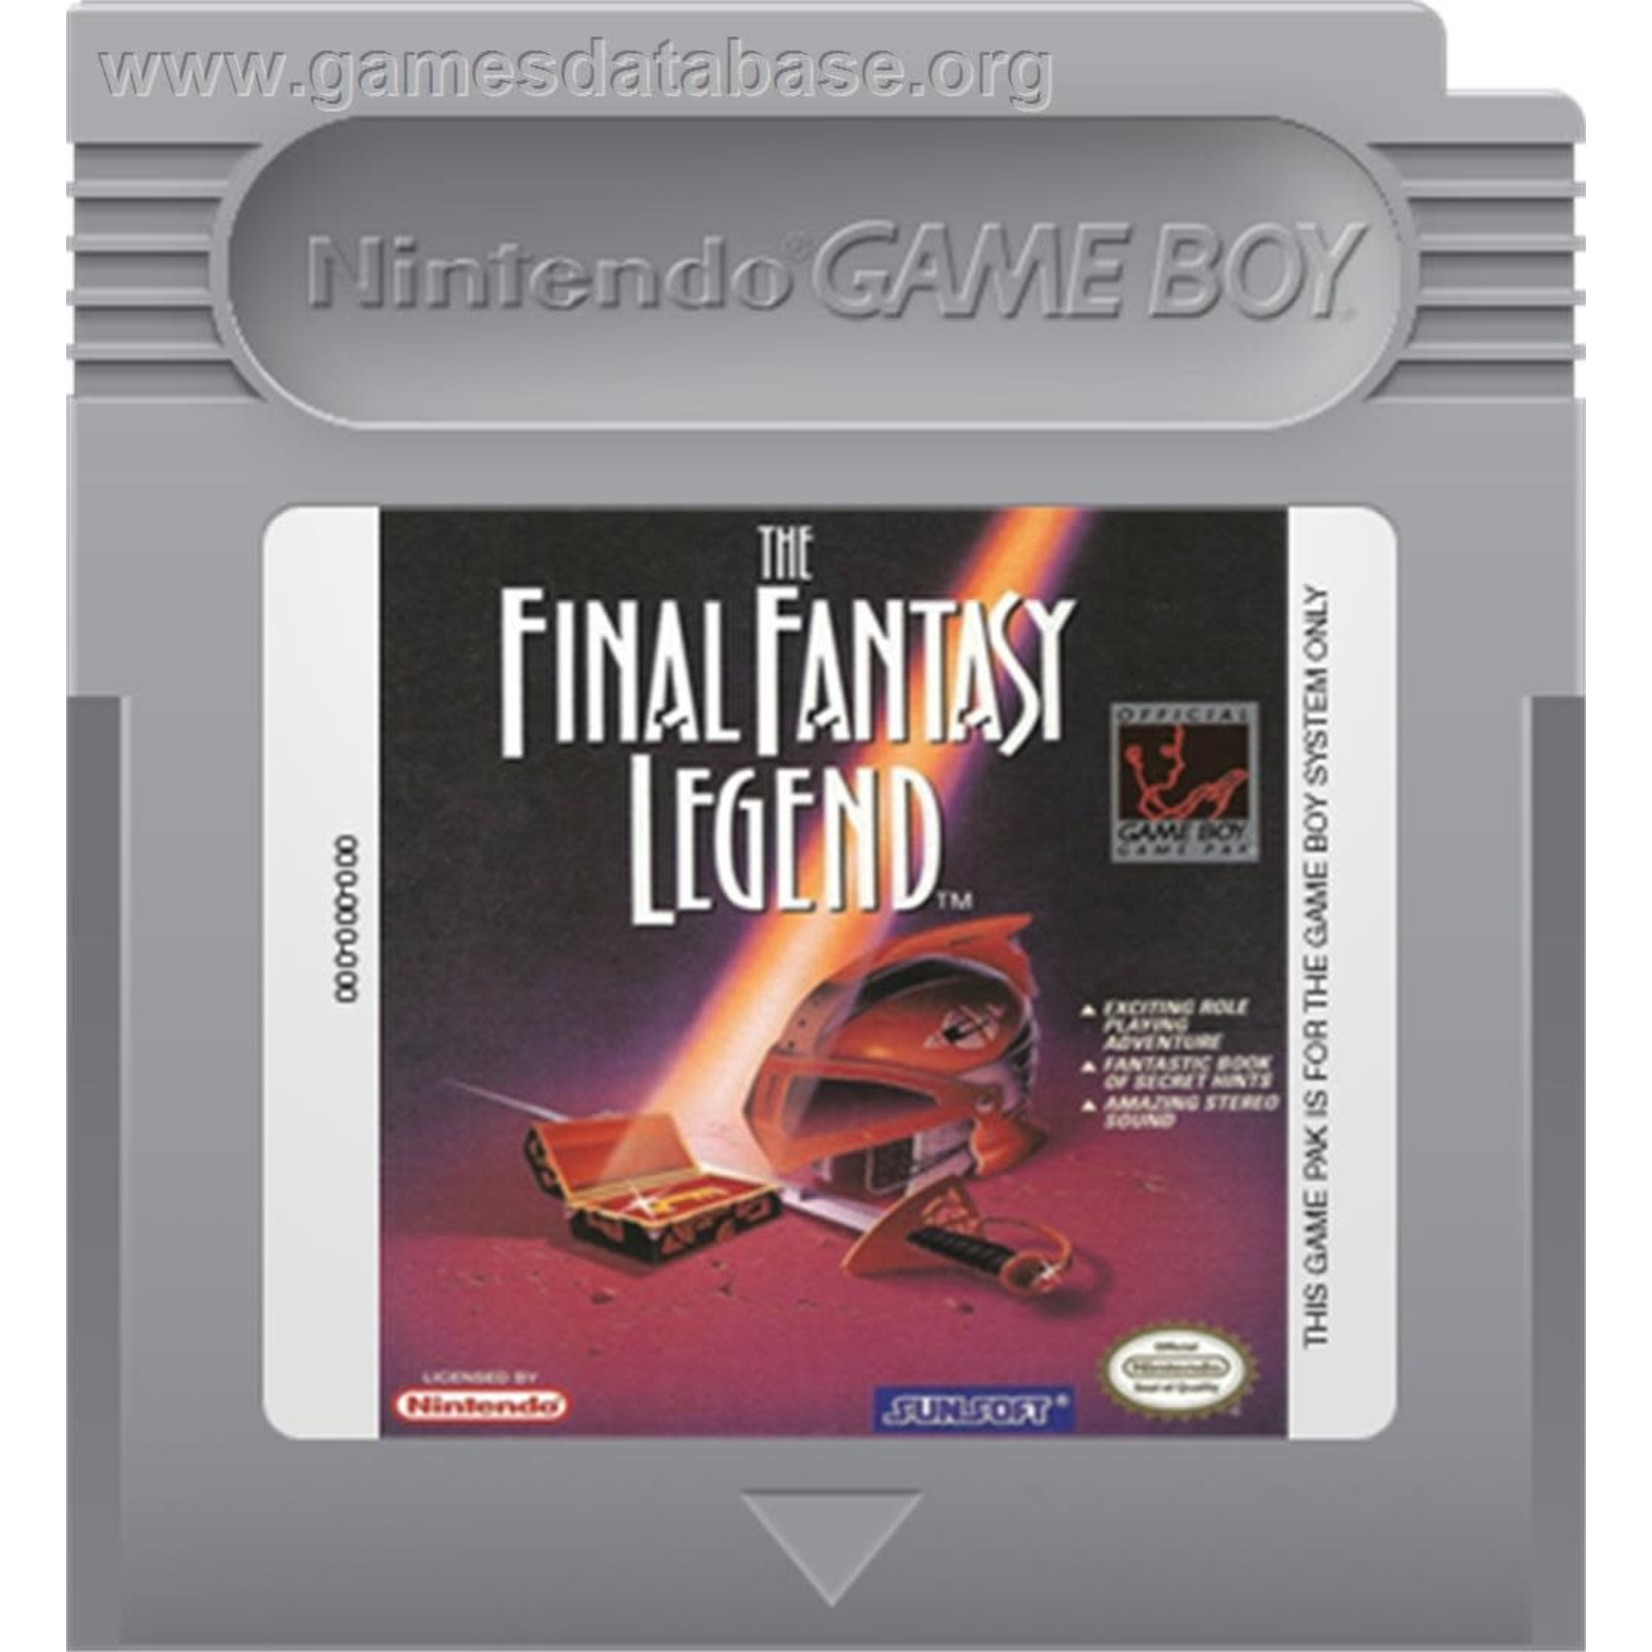 GBU-Final Fantasy Legend (CART ONLY)